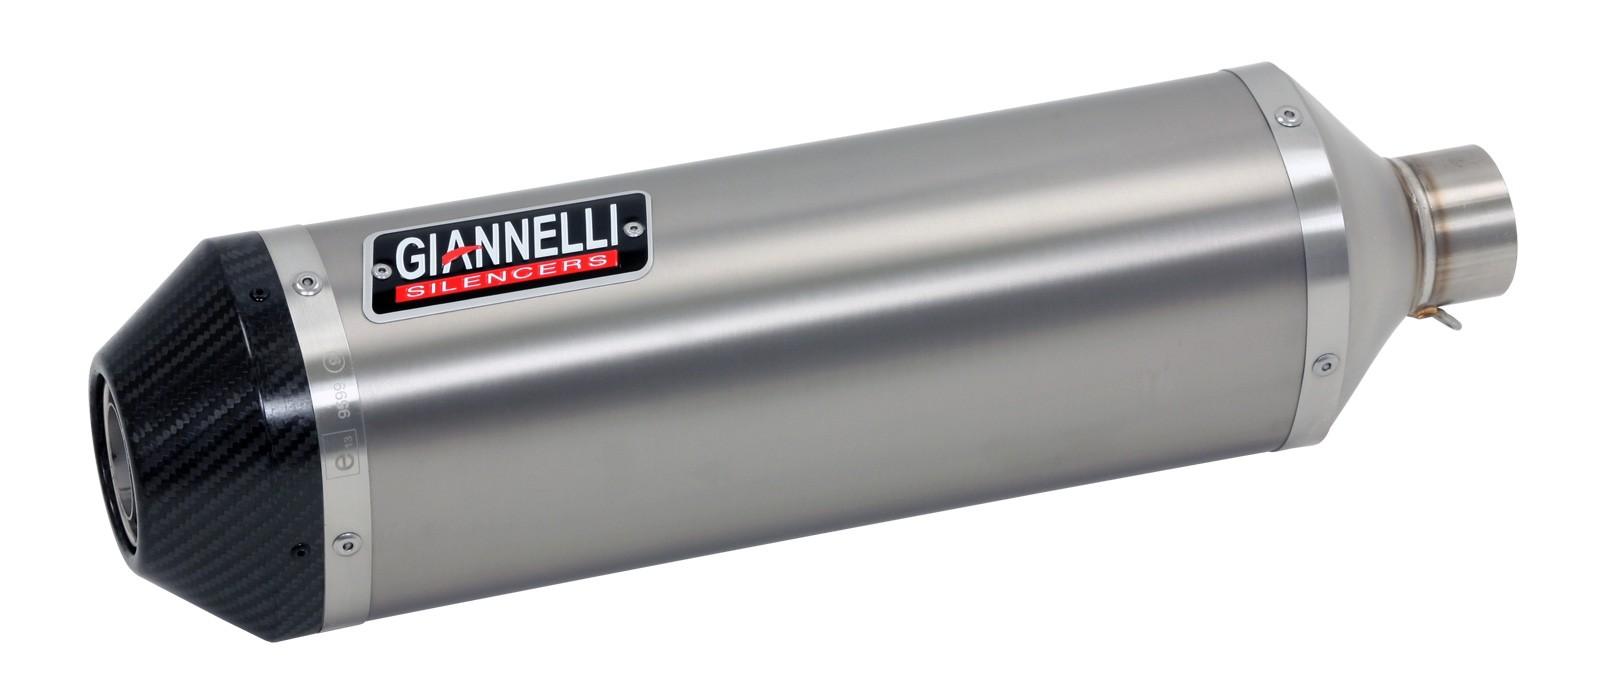 ESCAPES GIANNELLI YAMAHA - Sistema completo IPERSPORT Silenciador titanio con terminación carbono Yamaha MT-125 Giannell